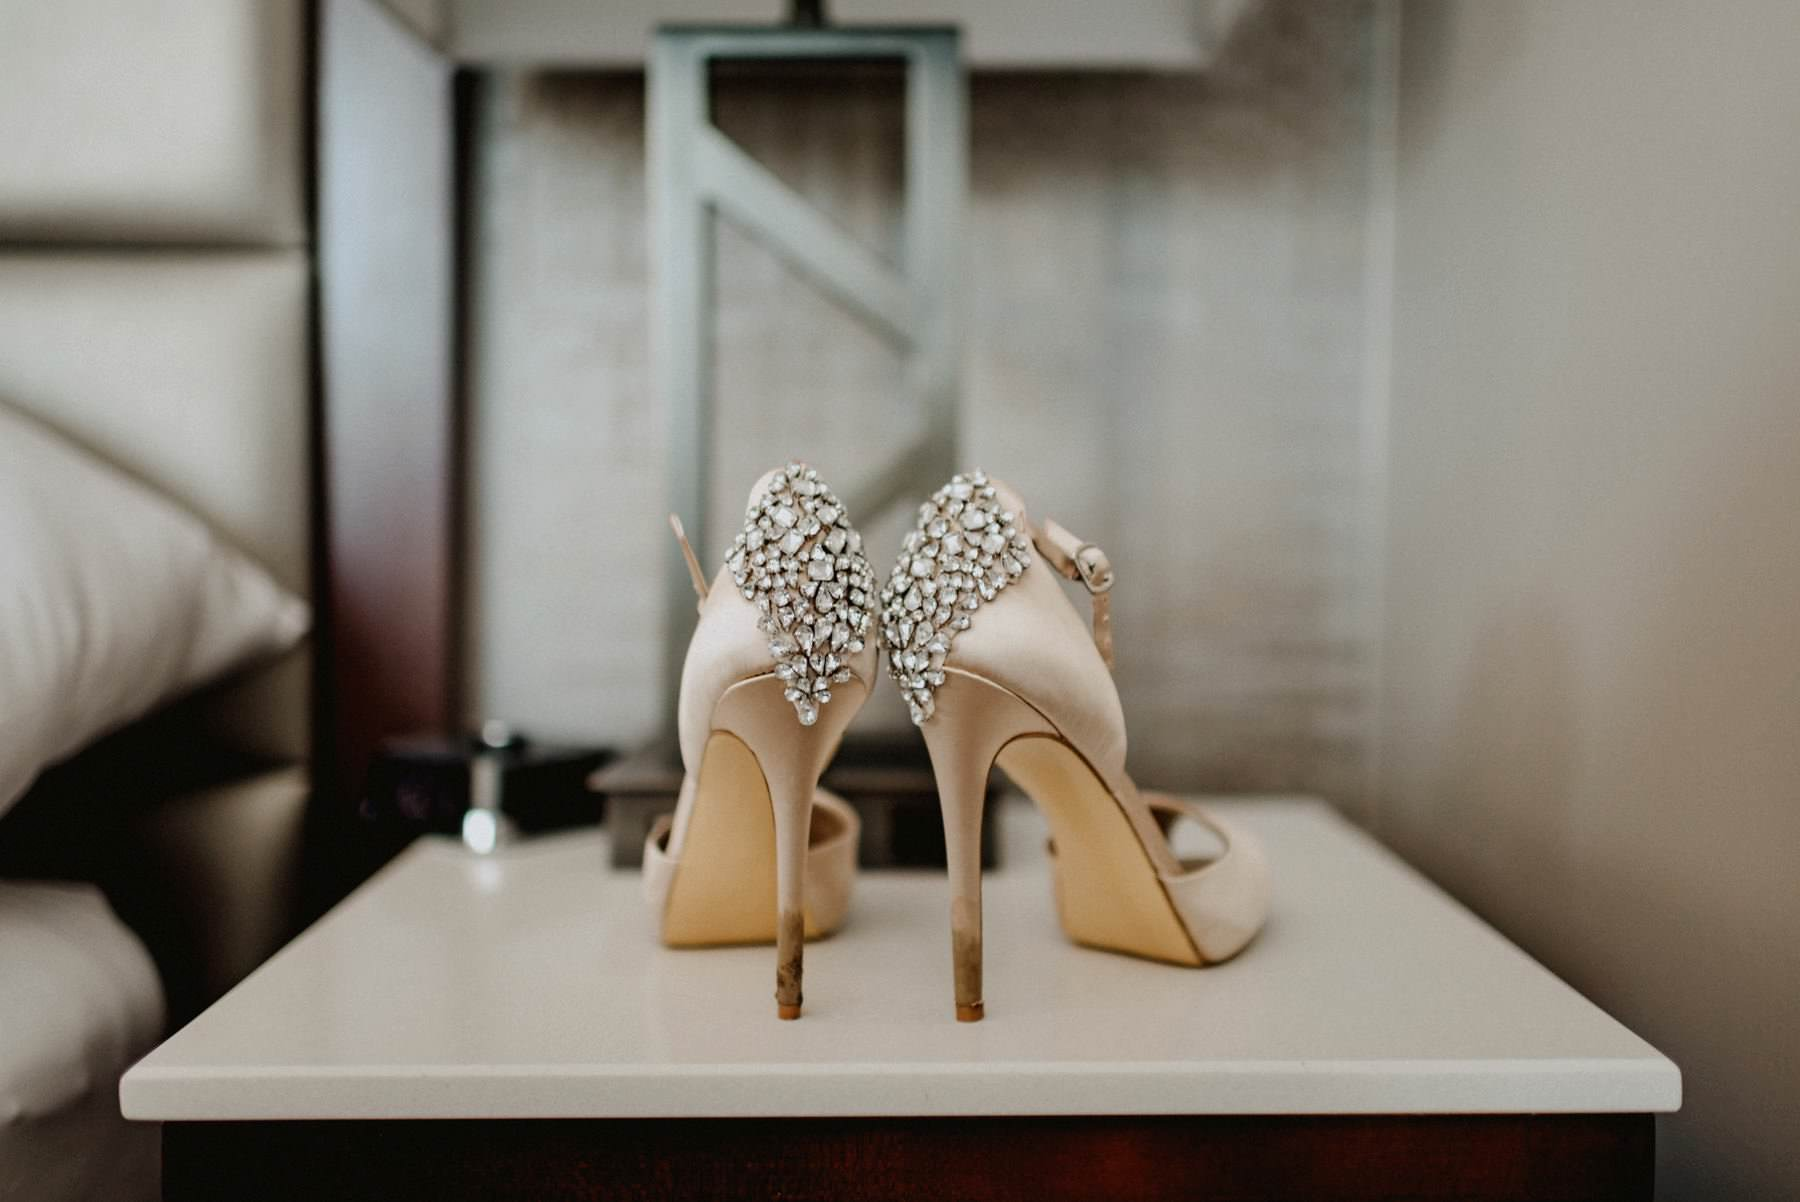 Appleford-estate-wedding-2.jpg